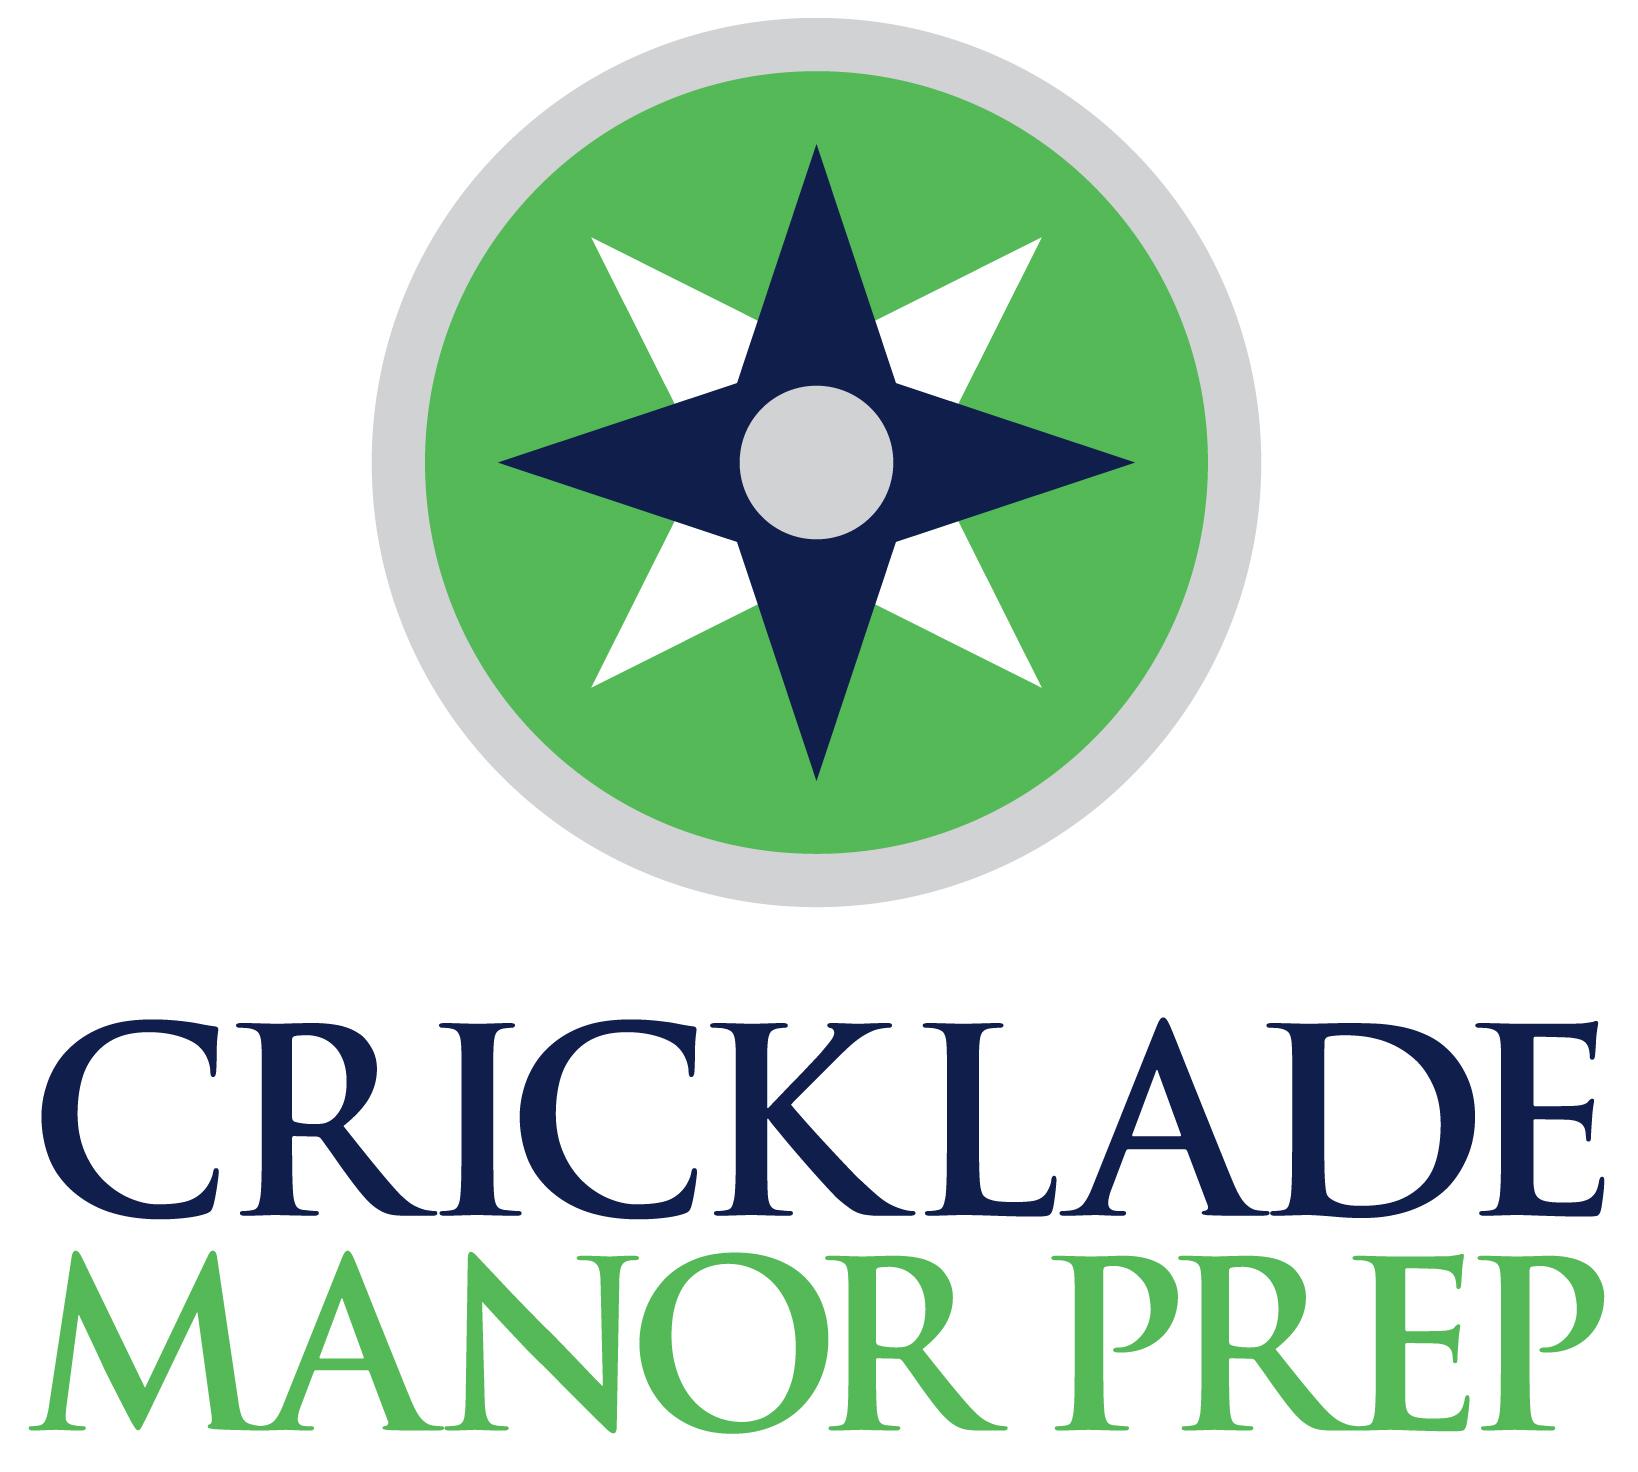 Cricklade Manor Preparatory